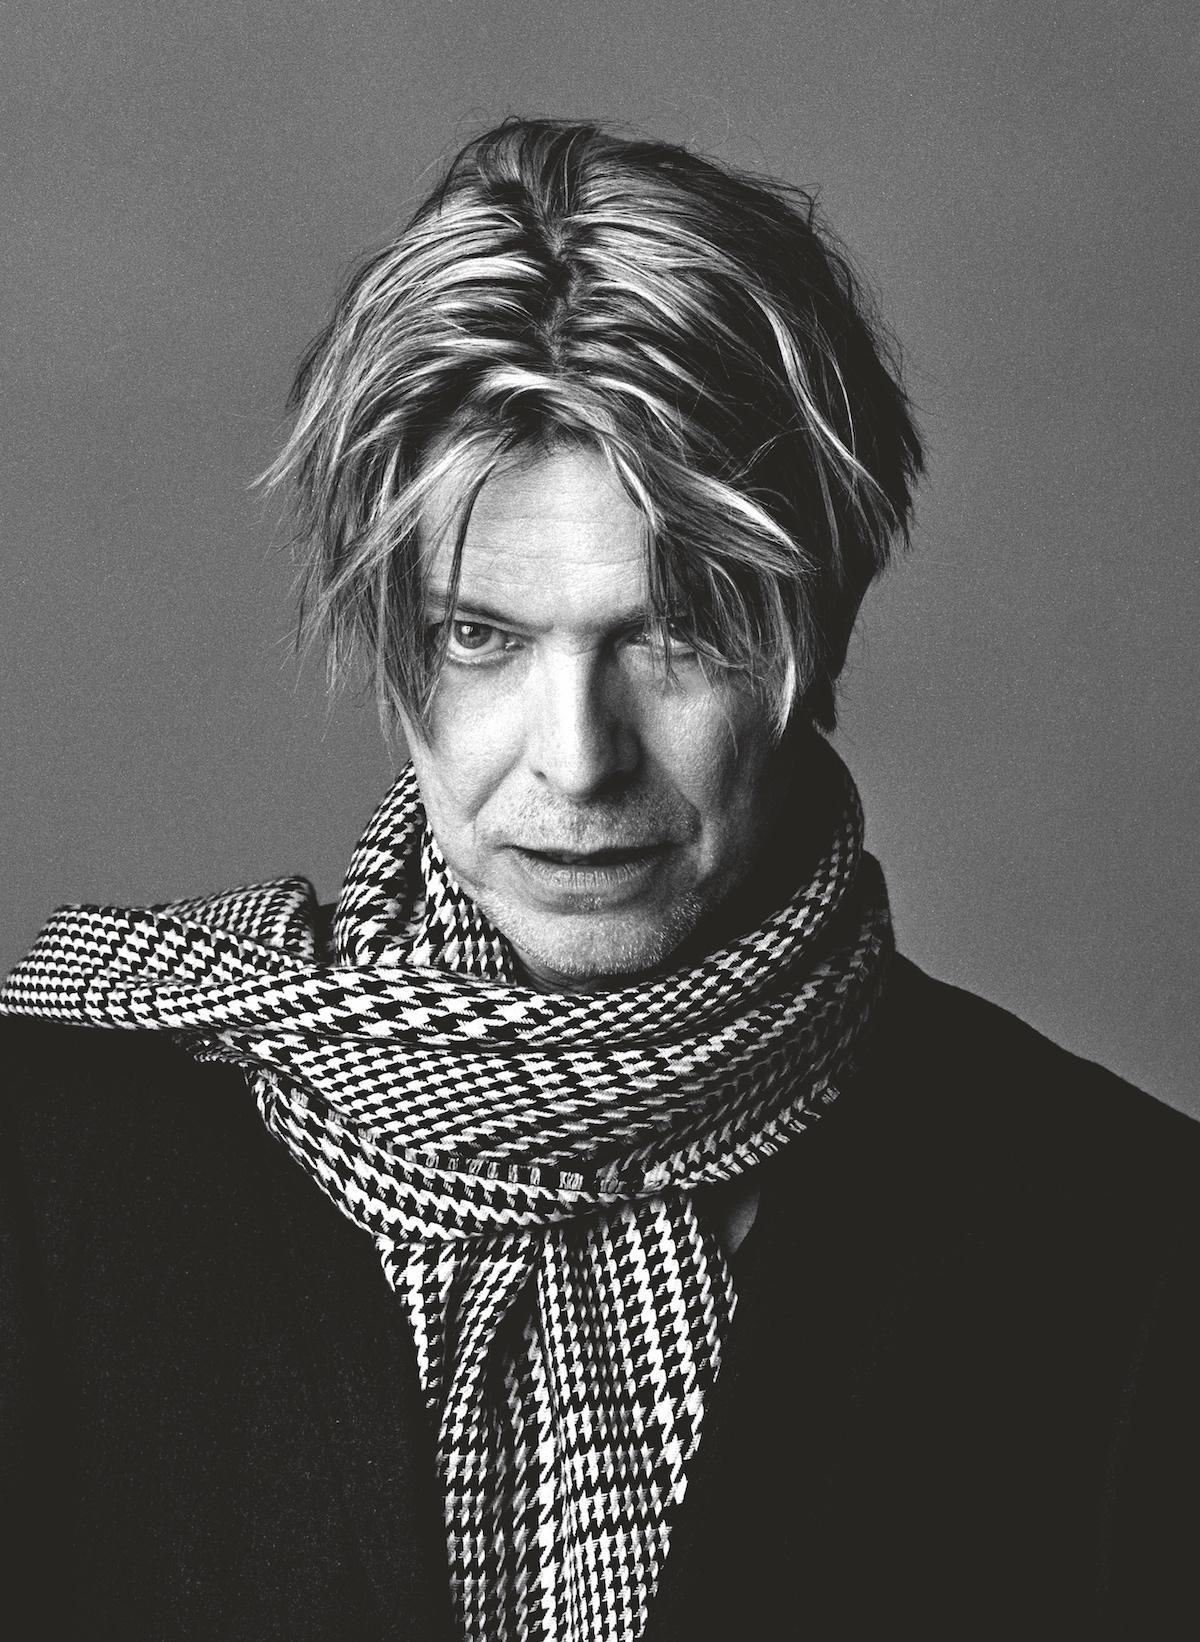 Sukita Portrait of David Bowie in 2002